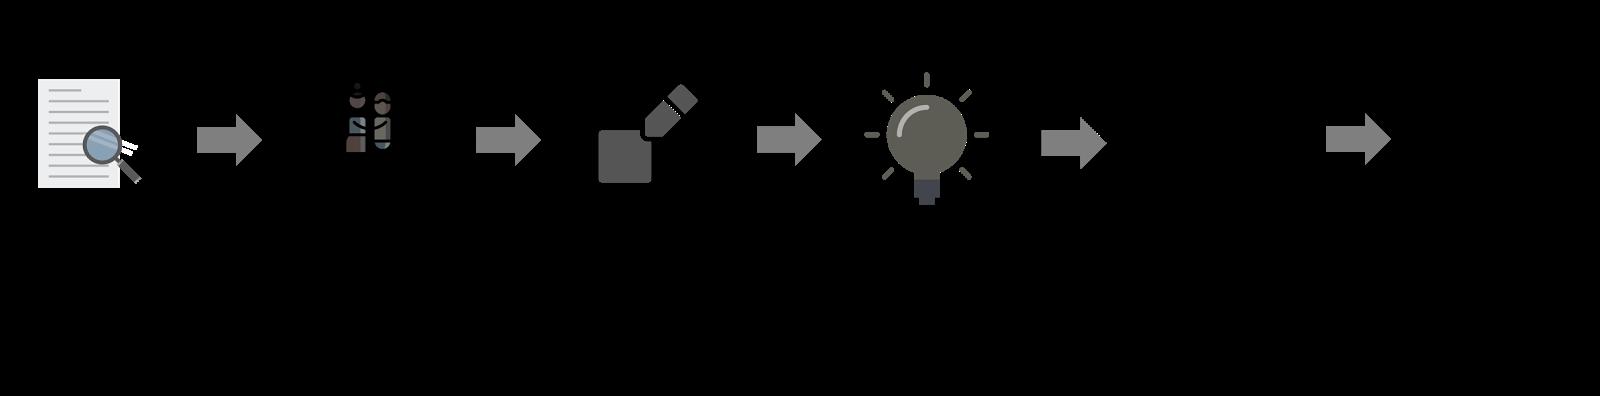 Fig. 1: Design Thinking Framework - Agile and Iterative UX.